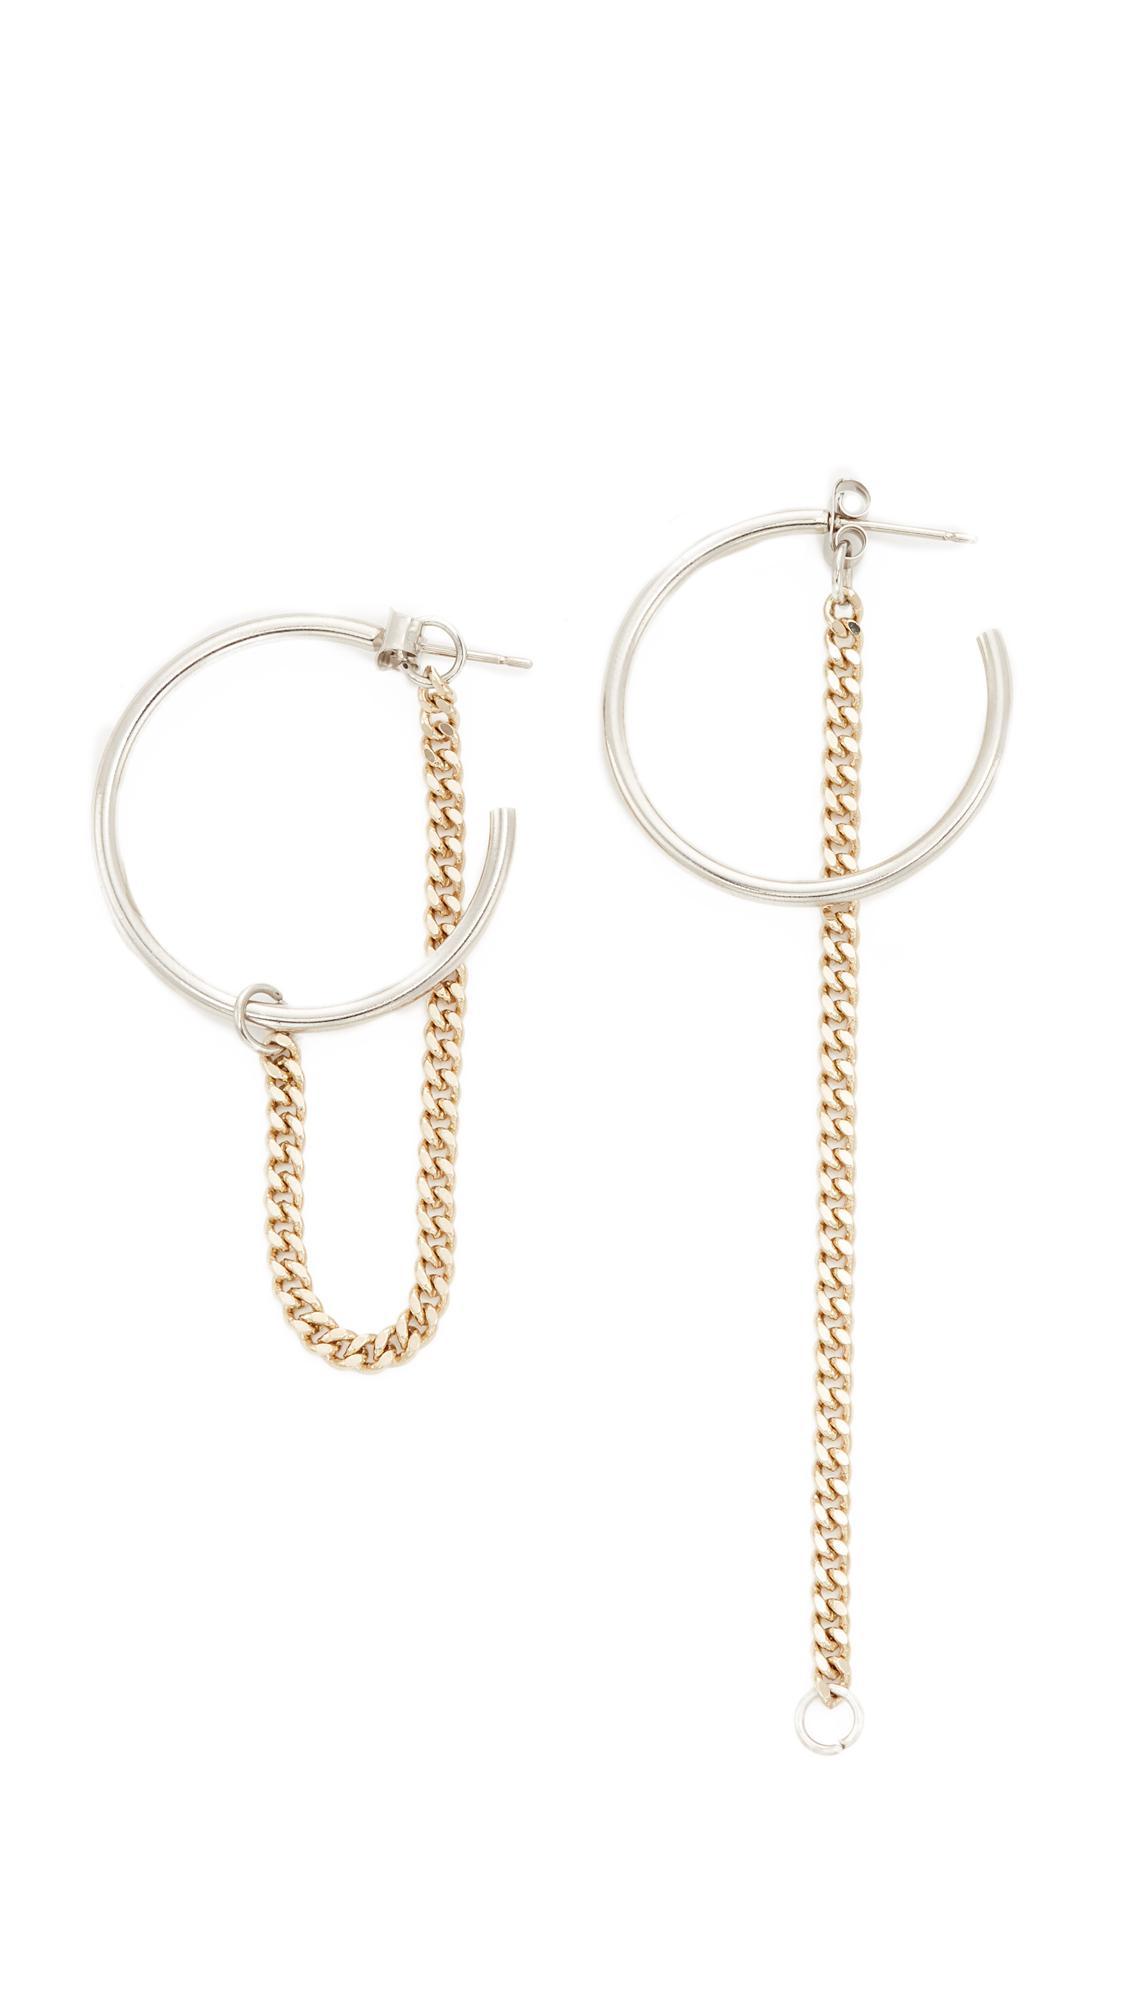 Justine Clenquet Bonnie hoop earrings - Metallic UKFQ5IAu